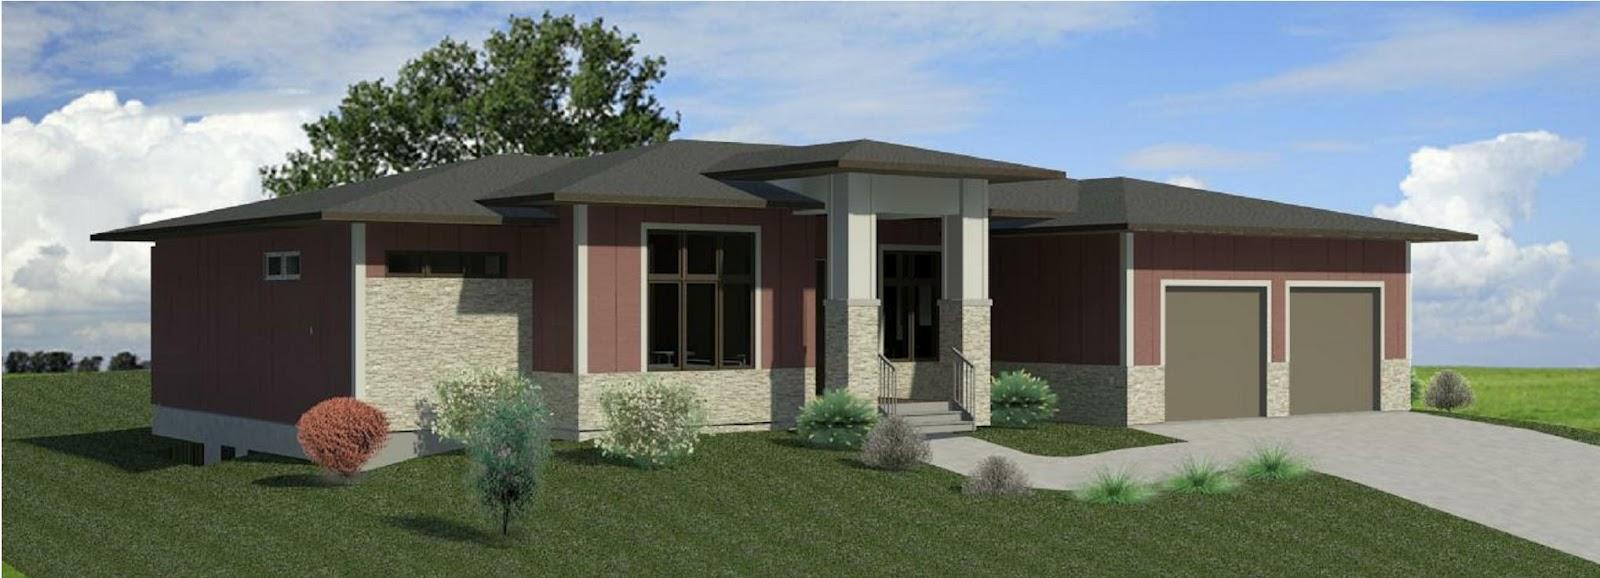 New Lizer Homestead: June 2012